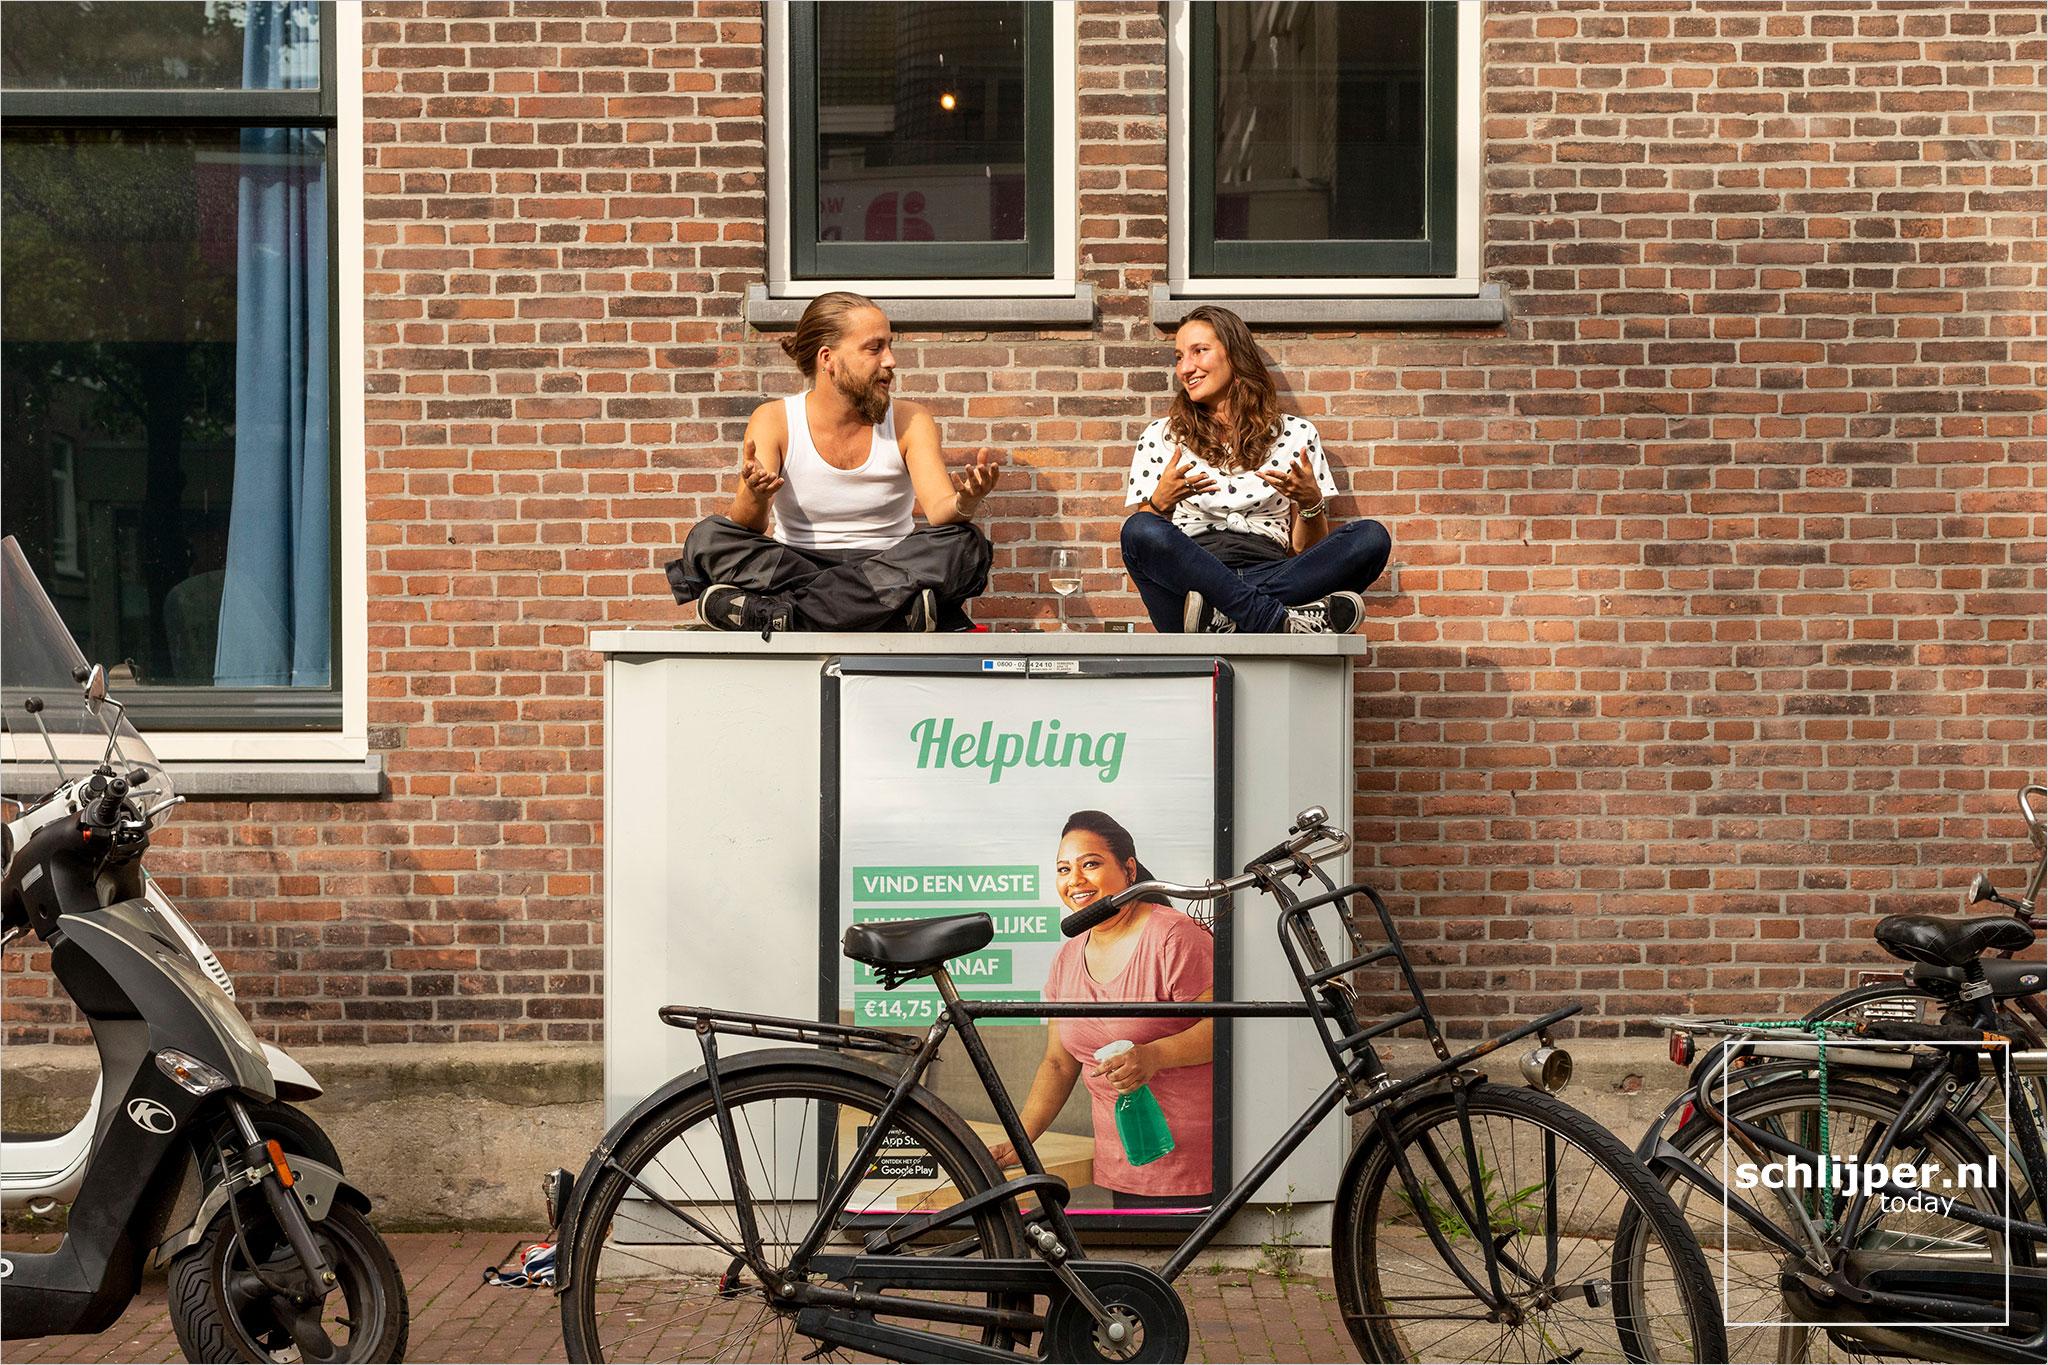 The Netherlands, Amsterdam, 20 augustus 2021